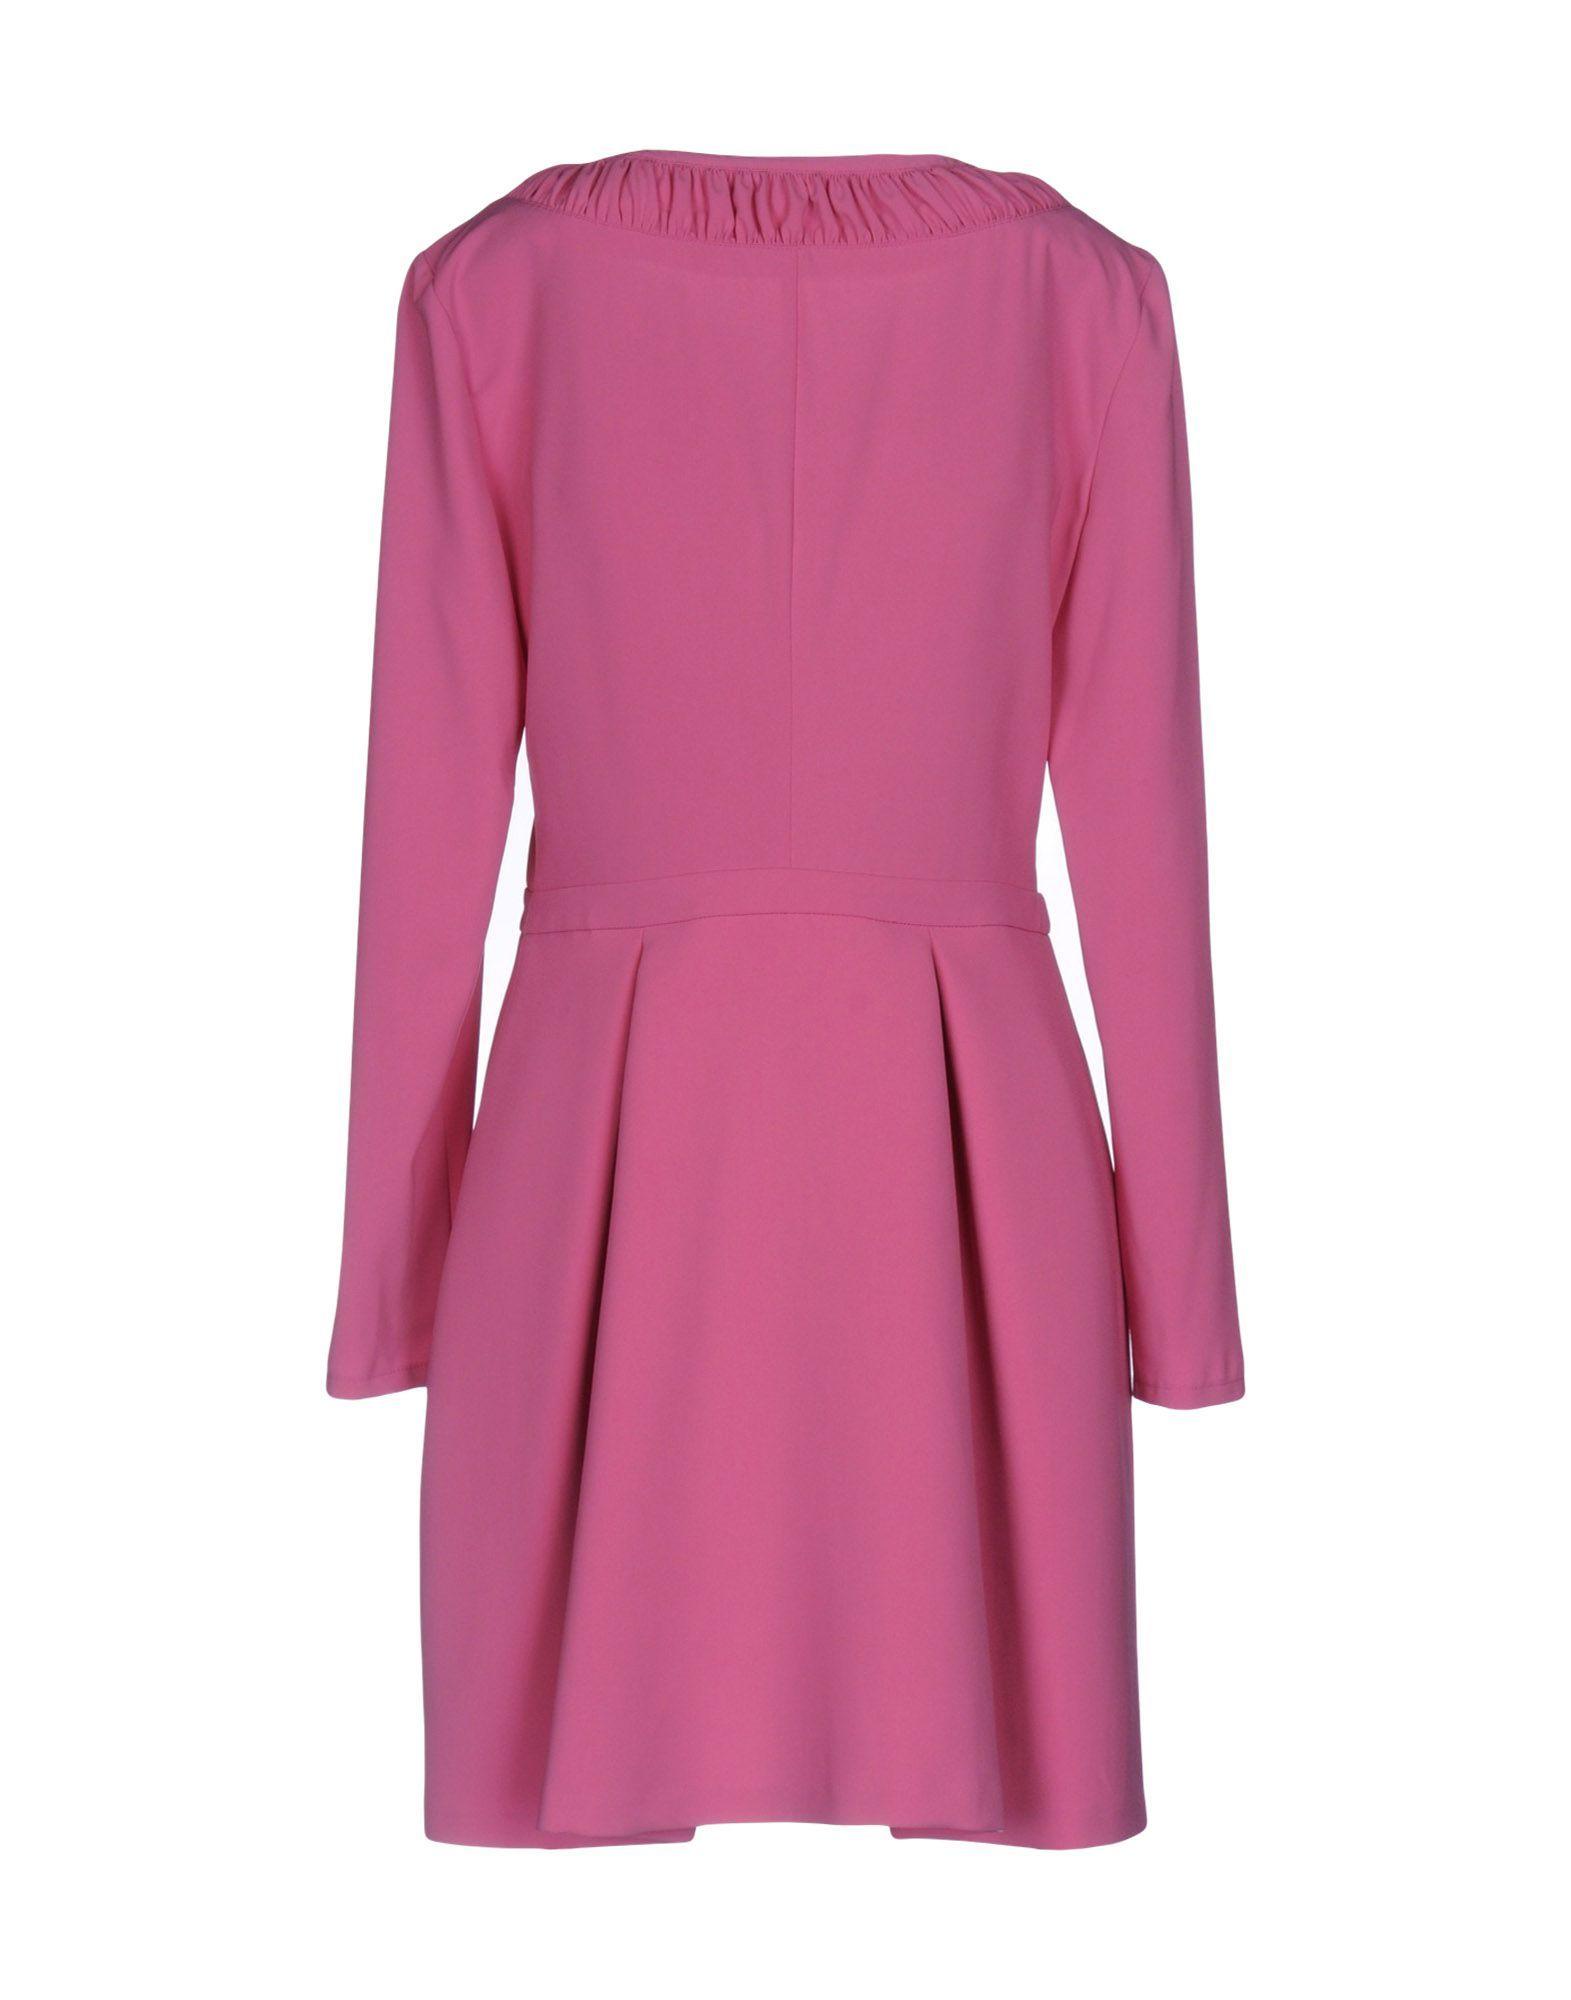 Patrizia Pepe Fuchsia Long Sleeve Dress